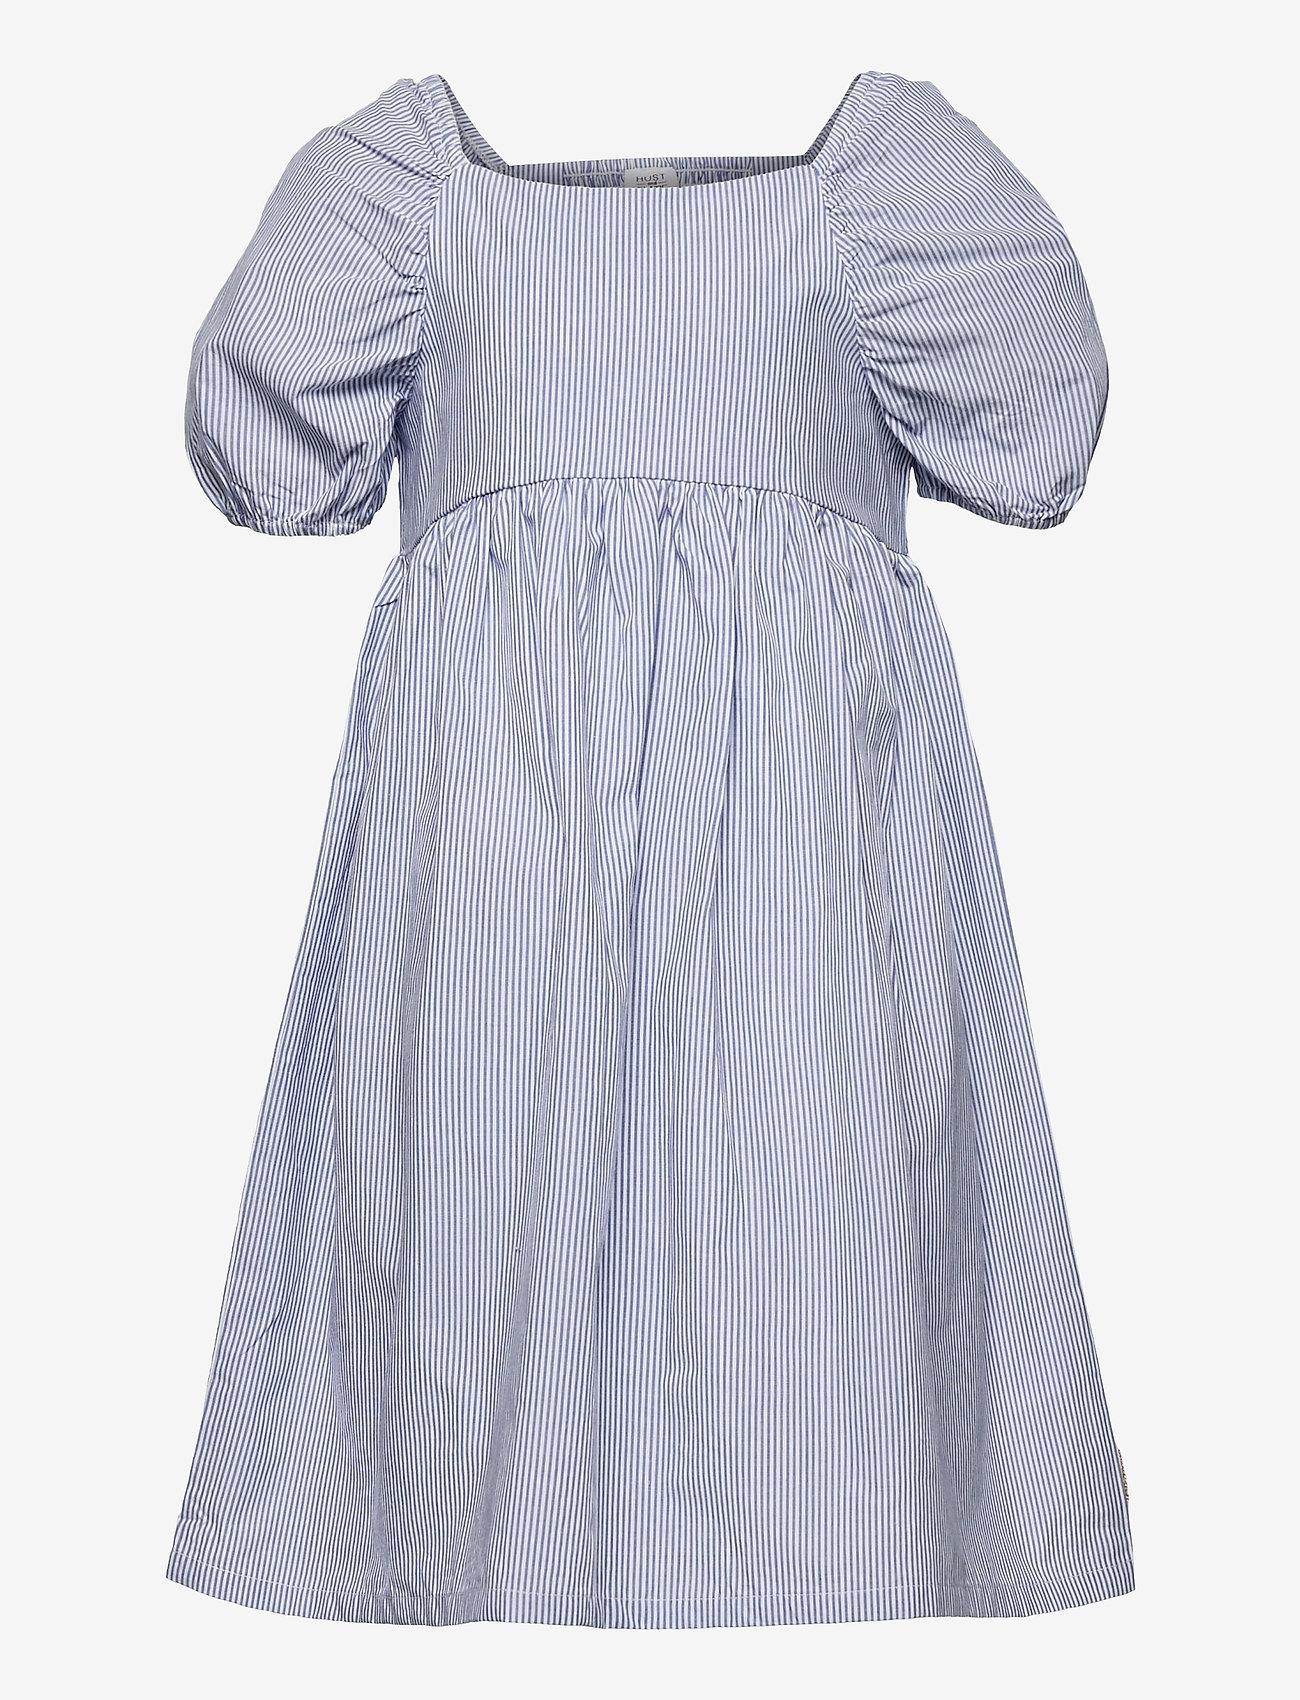 Hust & Claire - Kathy - Dress - kleider - dream blue - 0